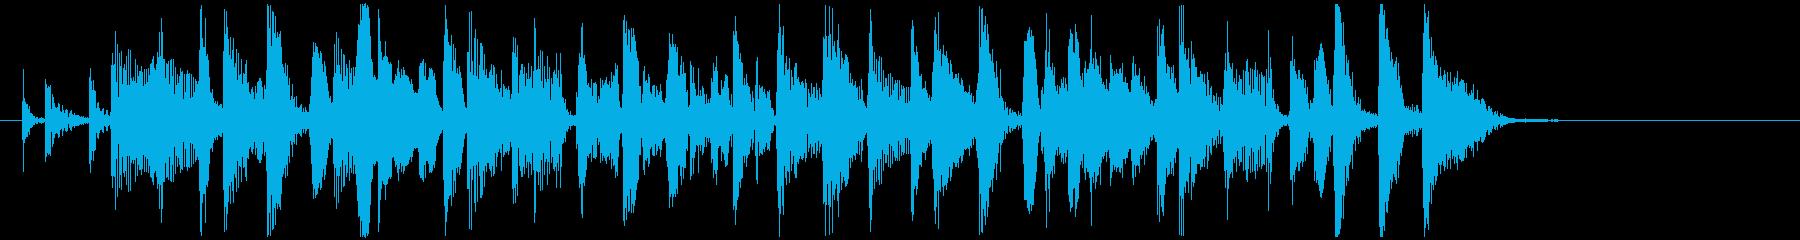 80's風味のファンキーなジングルの再生済みの波形